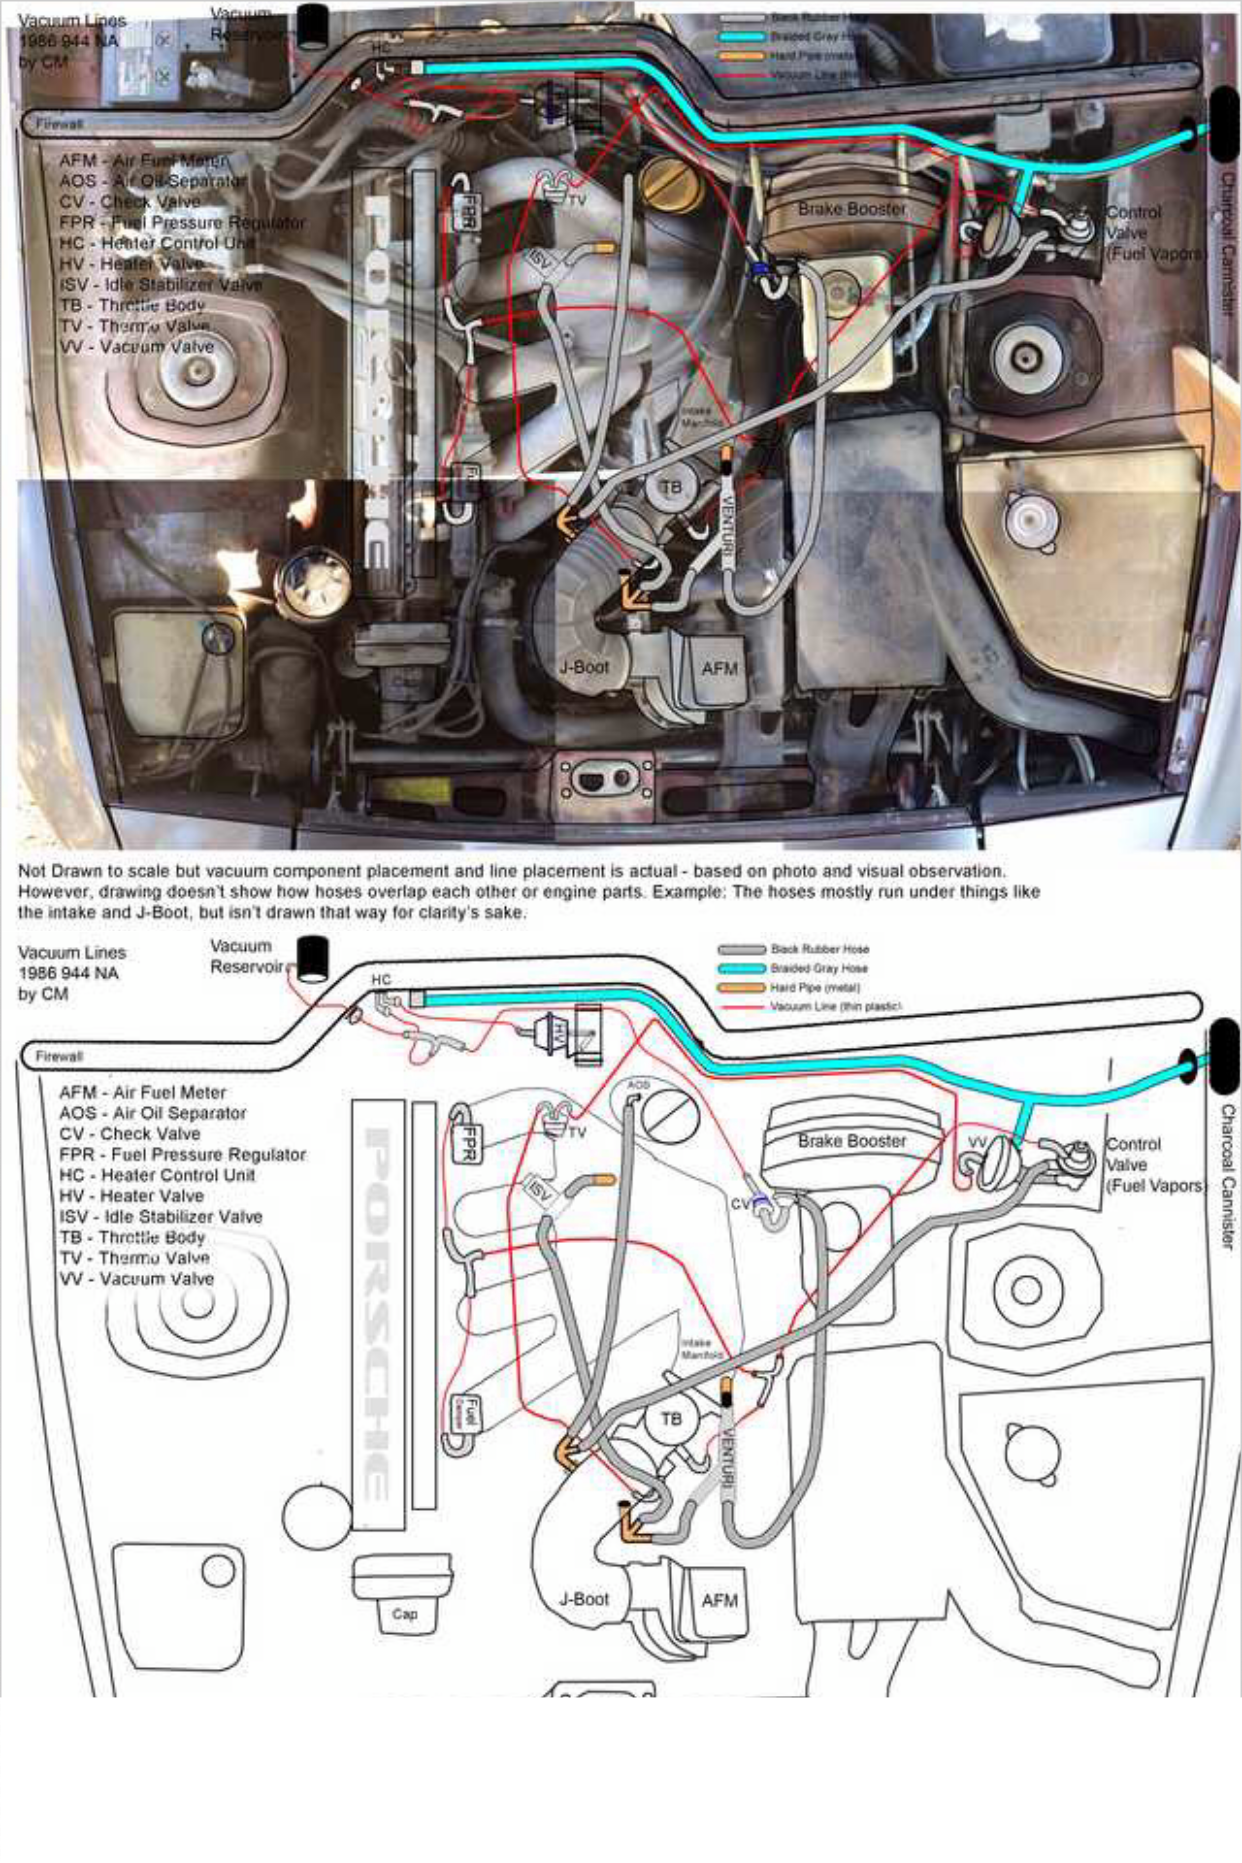 hight resolution of 1986 porsche 944 vacuum line diagram overlay porsche transaxles 1986 porsche 944 vacuum line diagram overlay